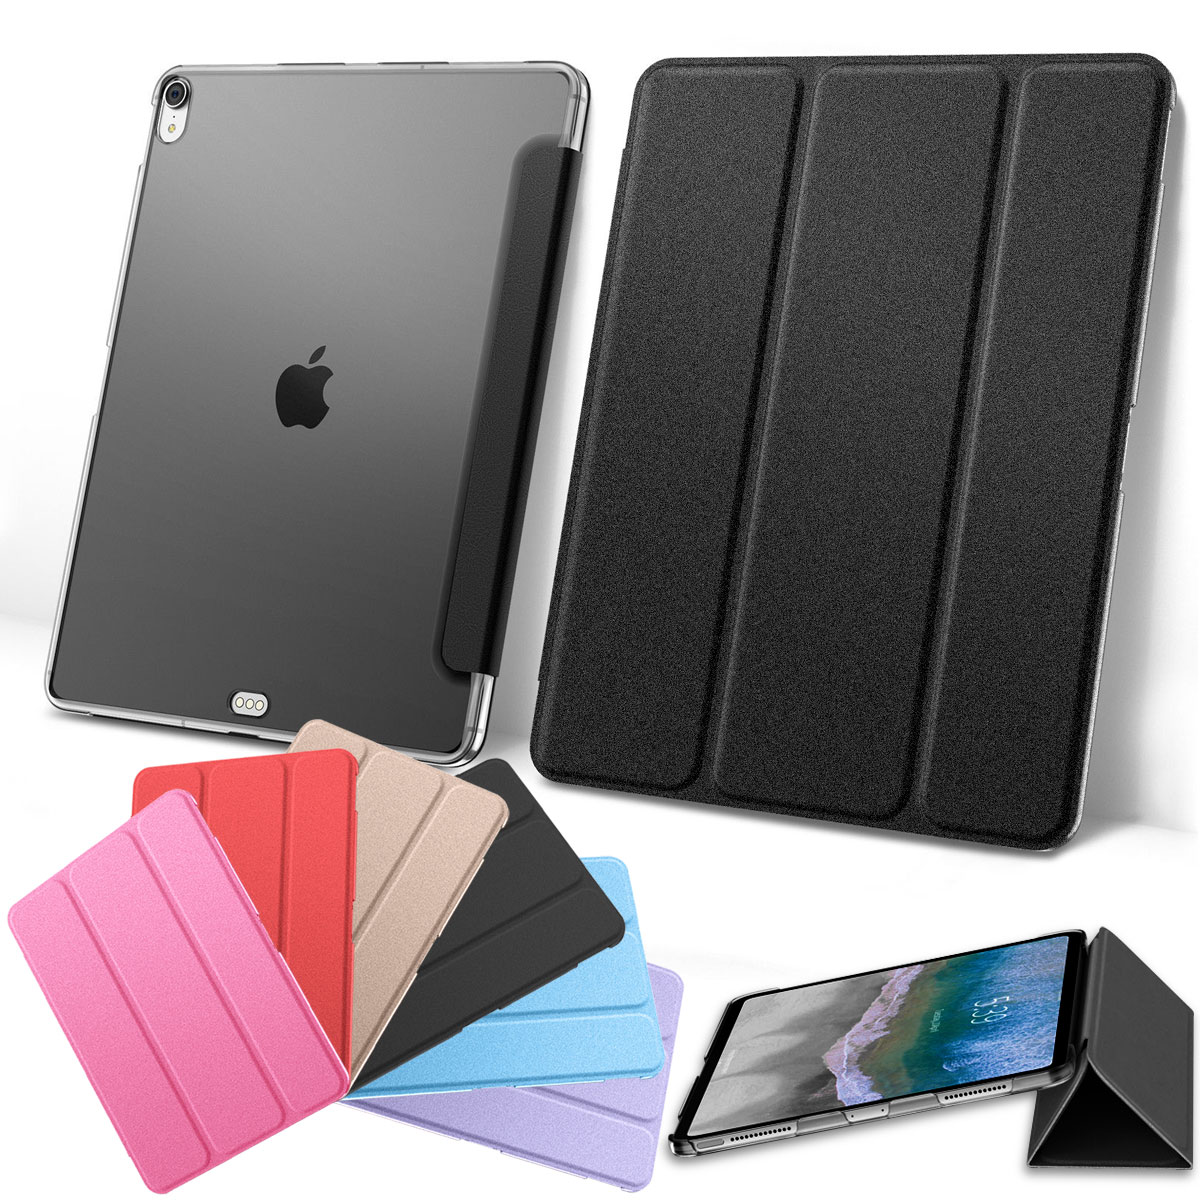 Apple IPad Pro 11 Cases Covers